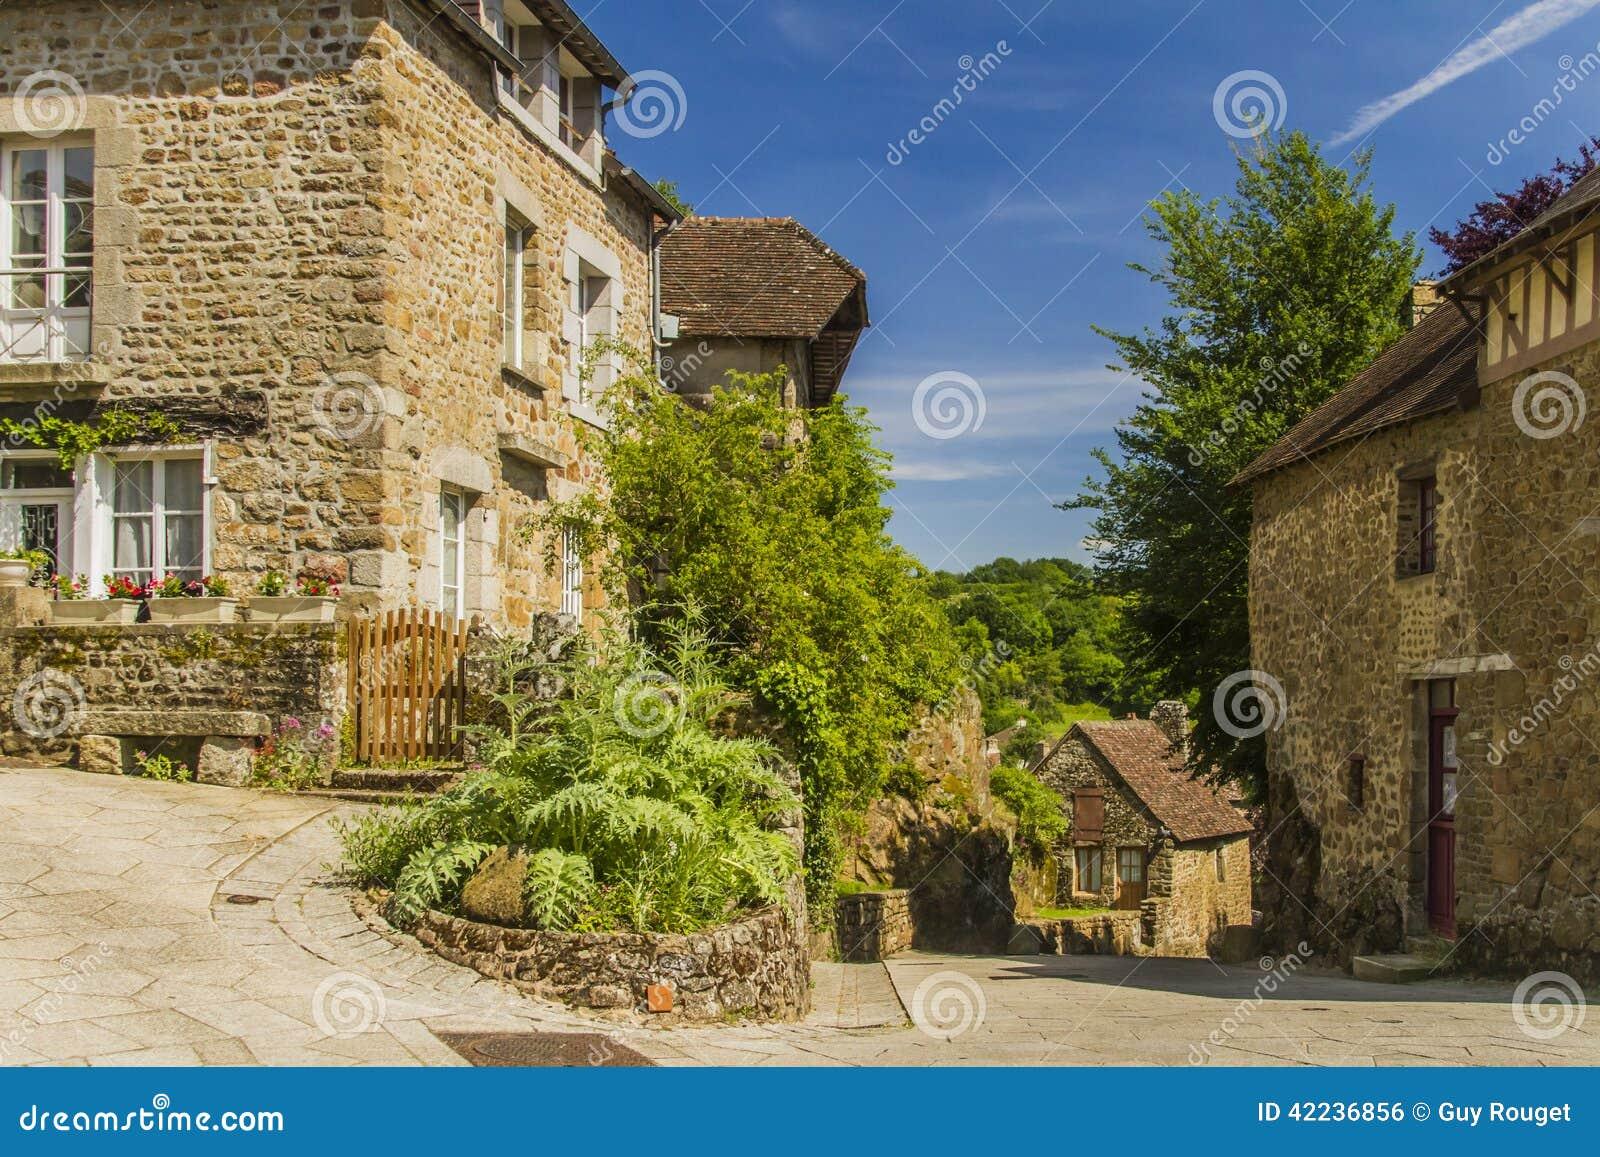 Stara wioska